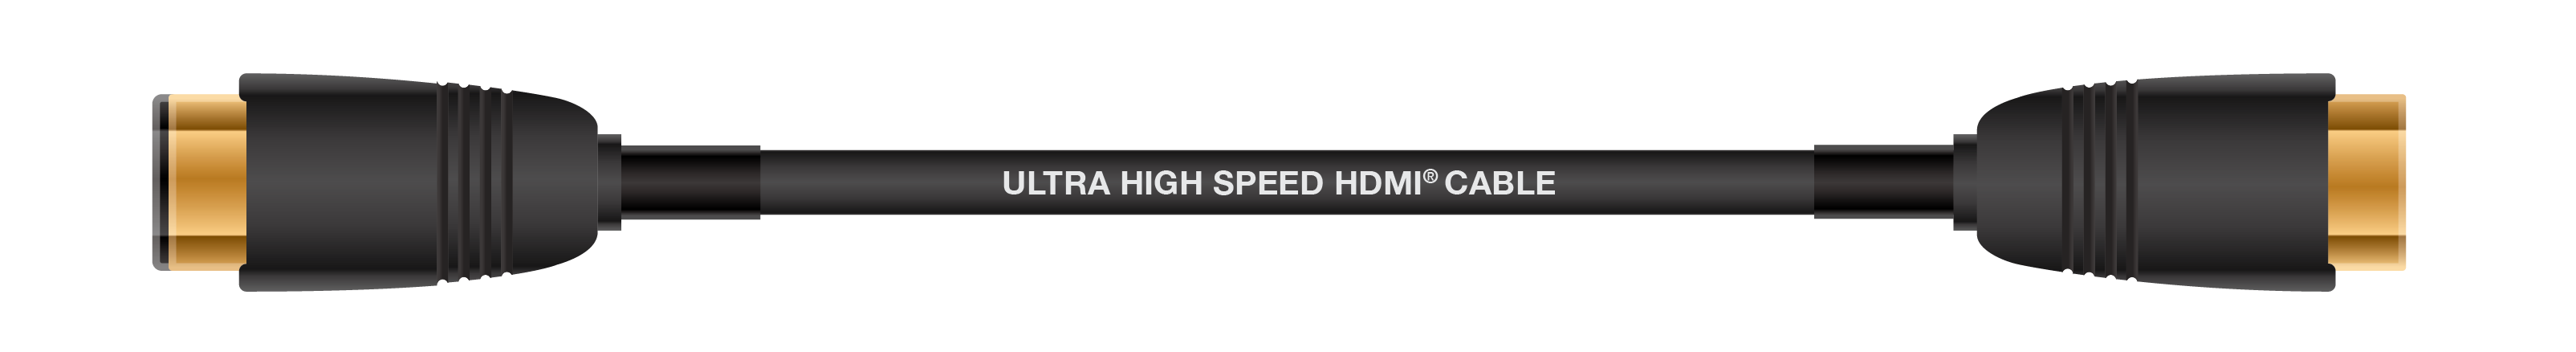 HDMI_BlackCable-01